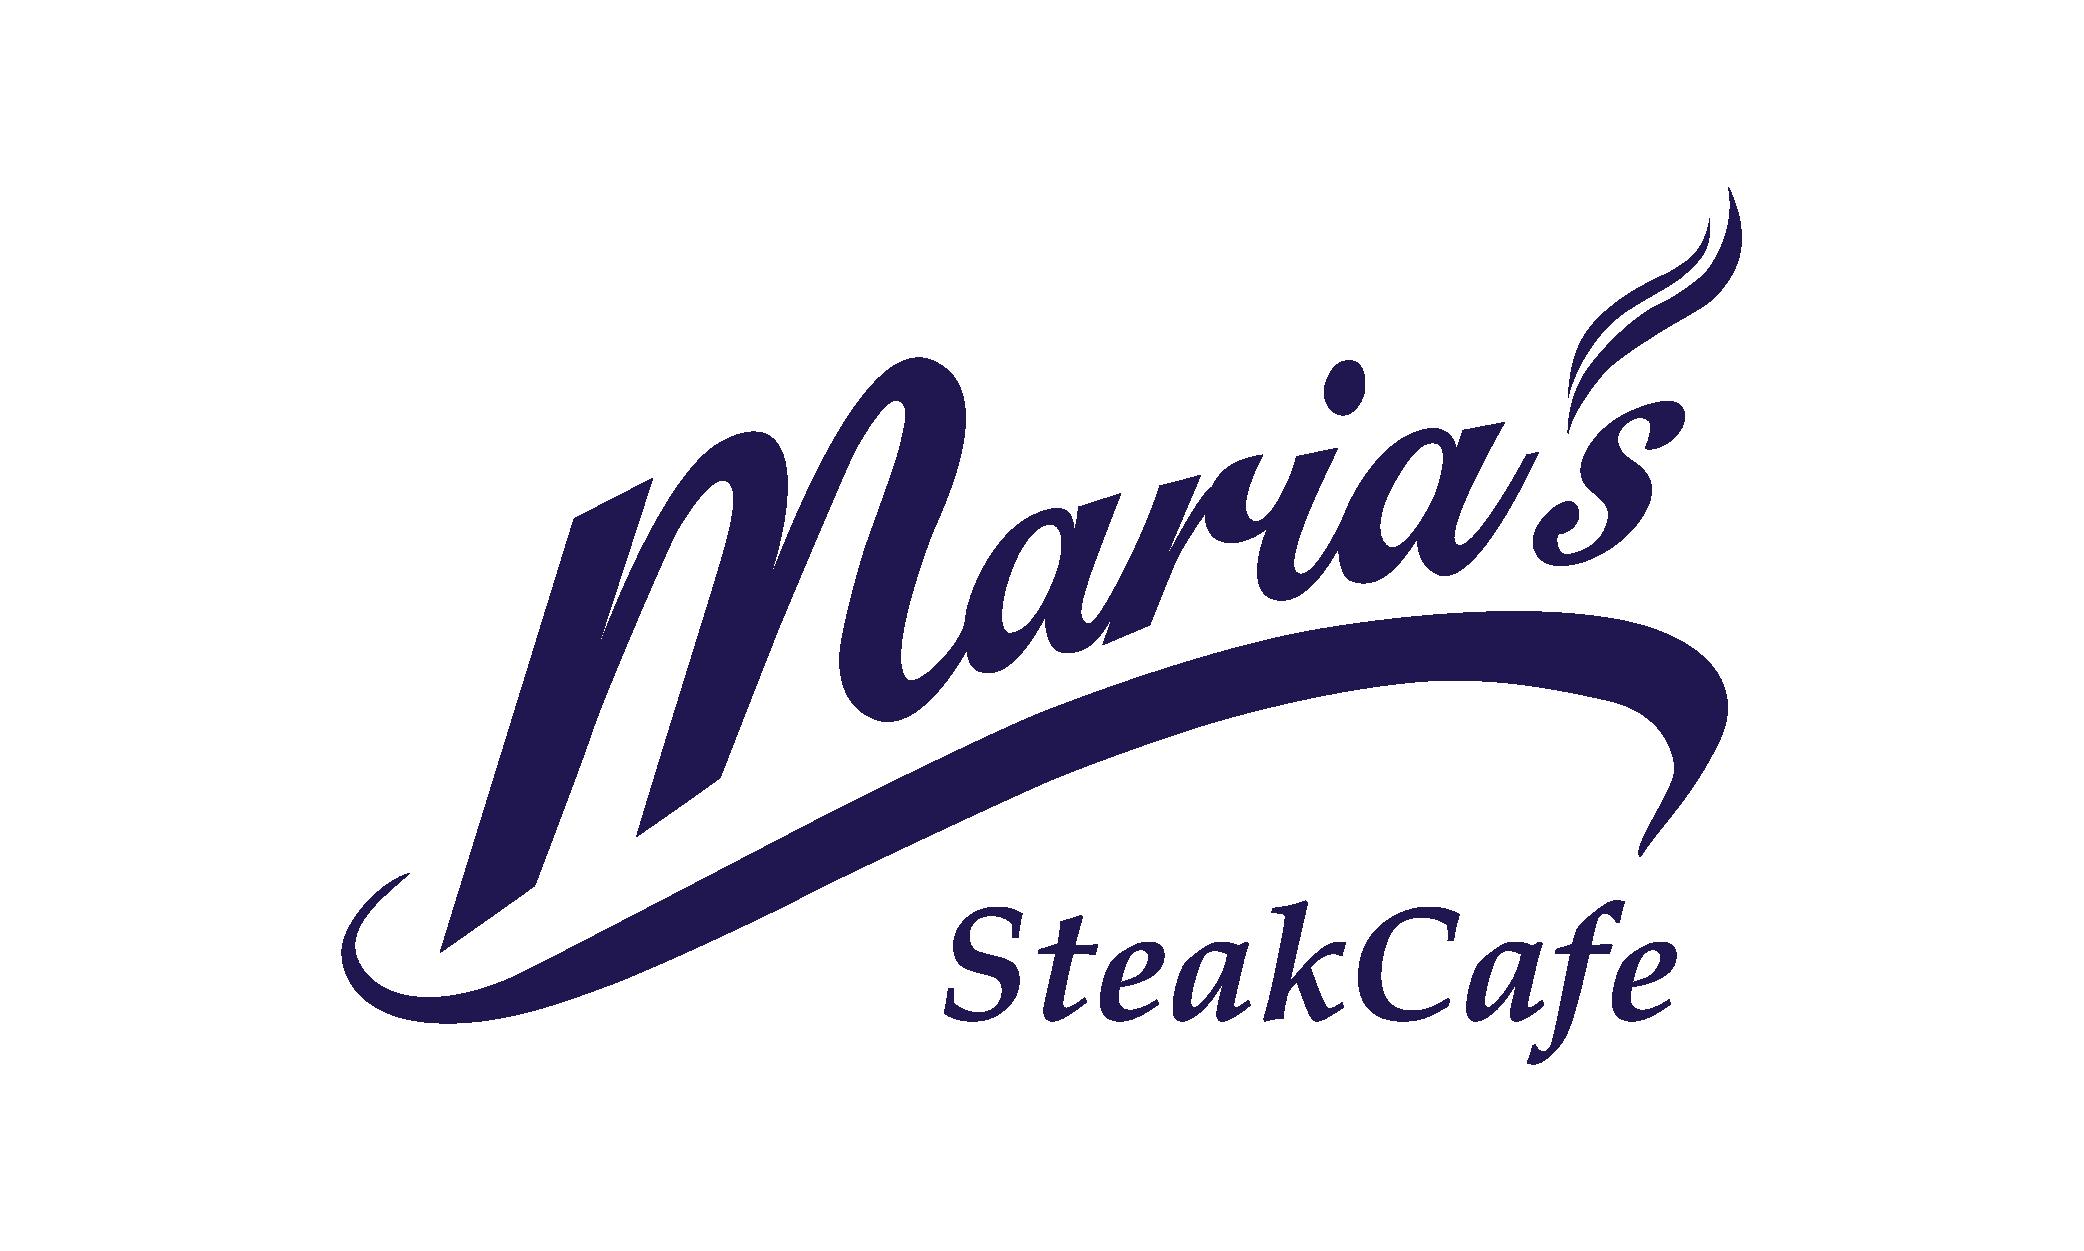 Maria's SteakCafe